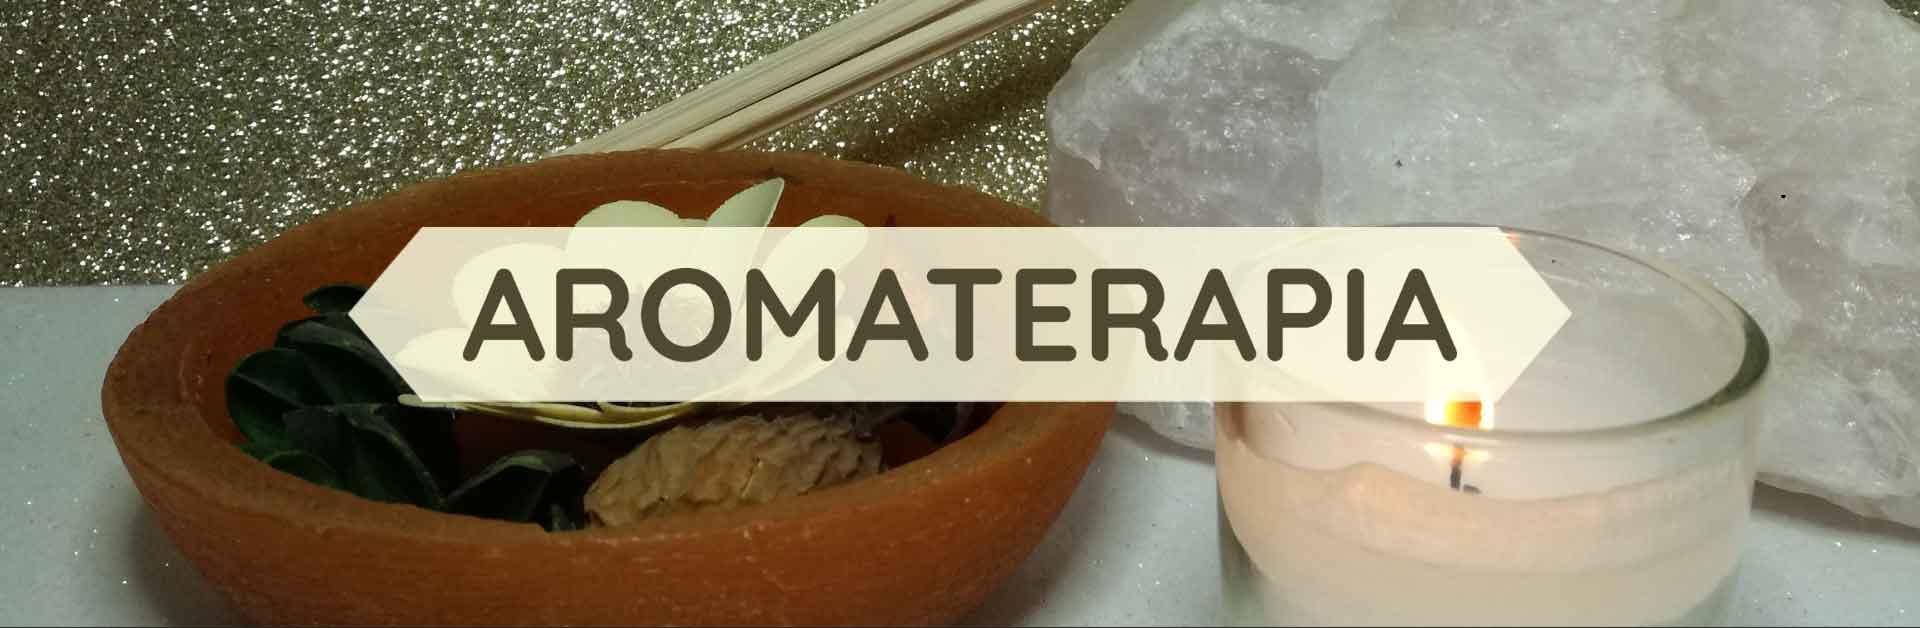 Copertina aromaterapia